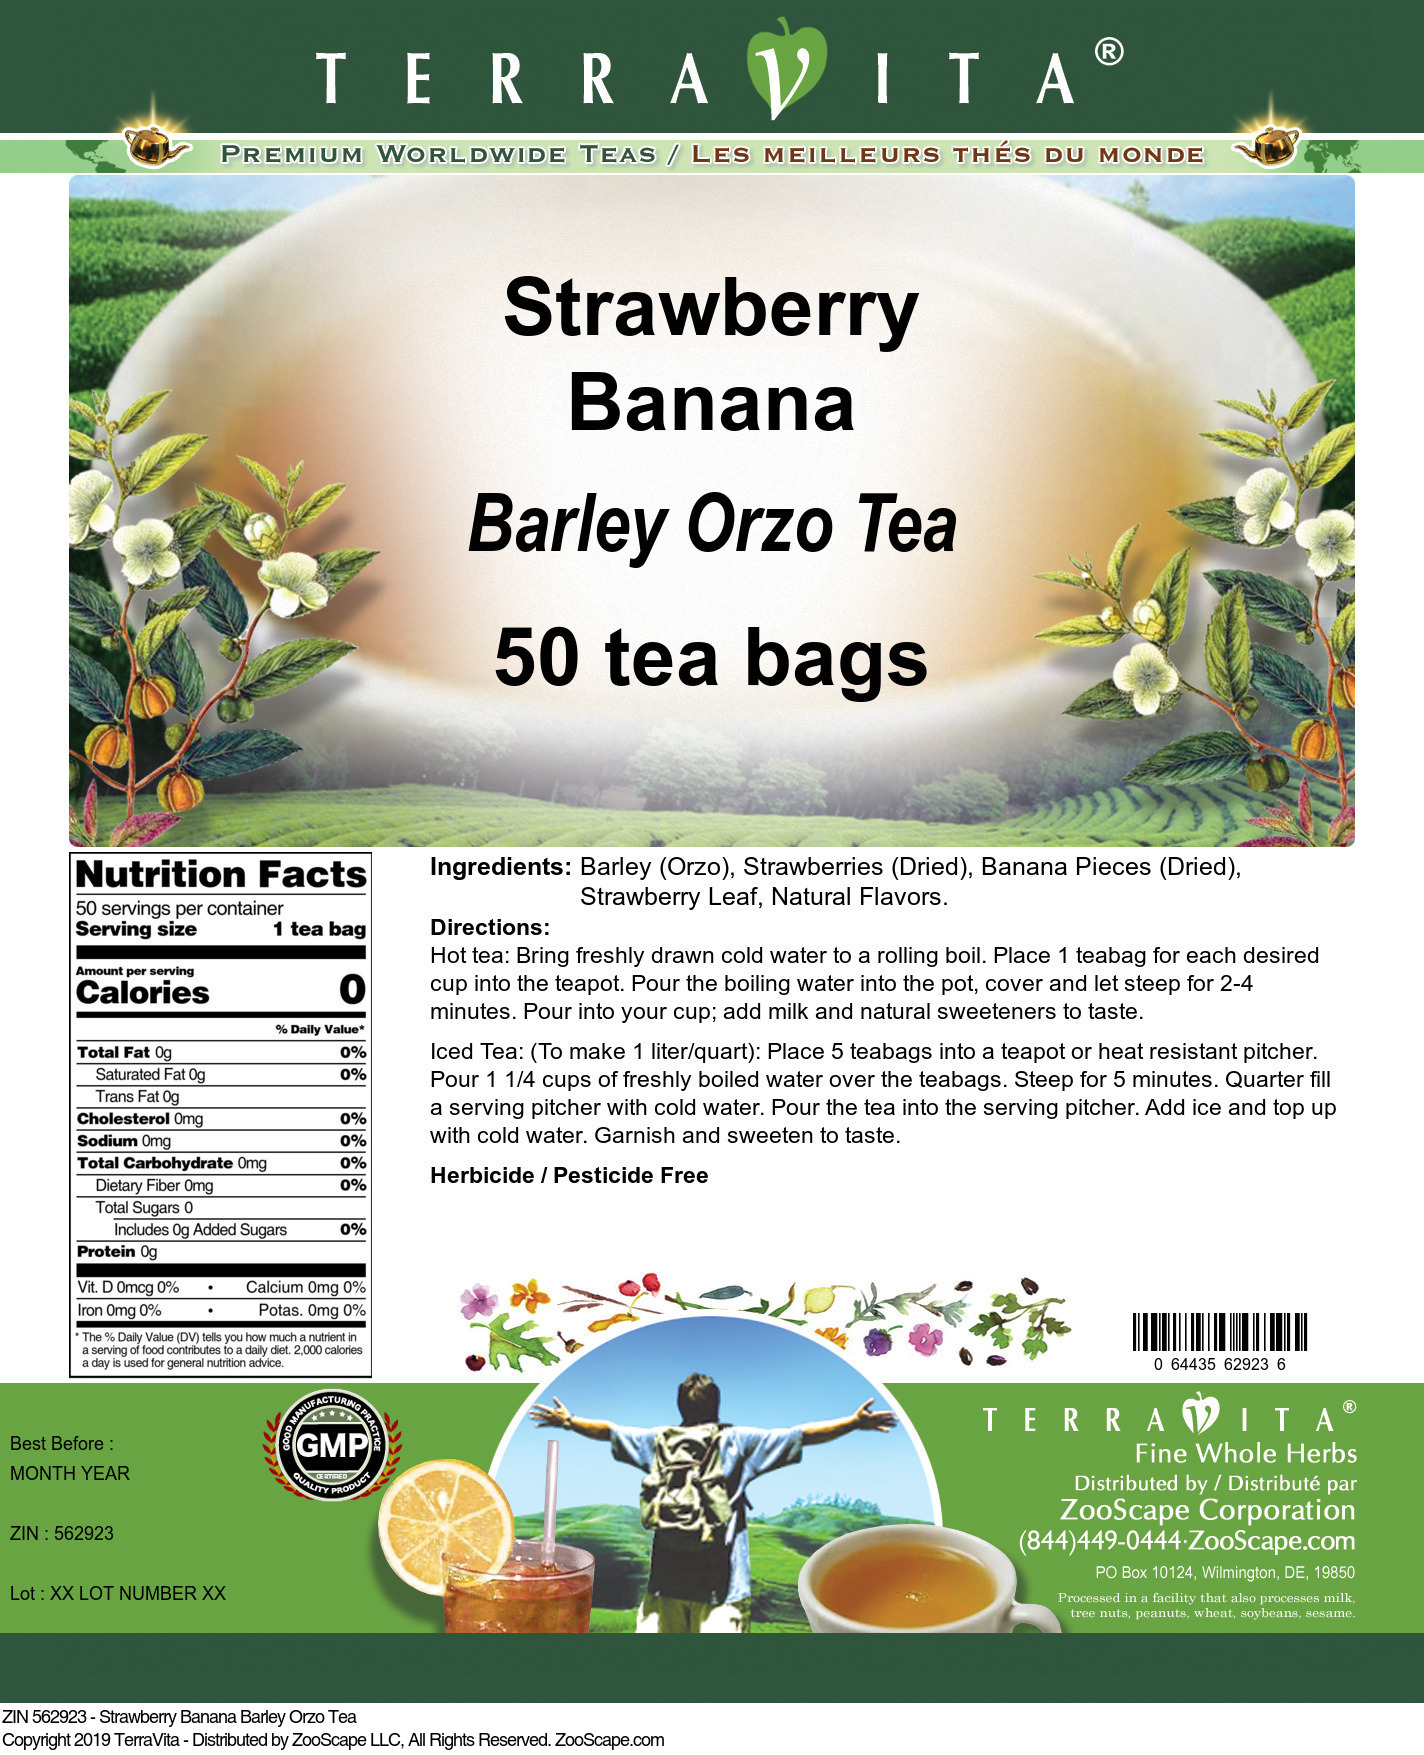 Strawberry Banana Barley Orzo Tea